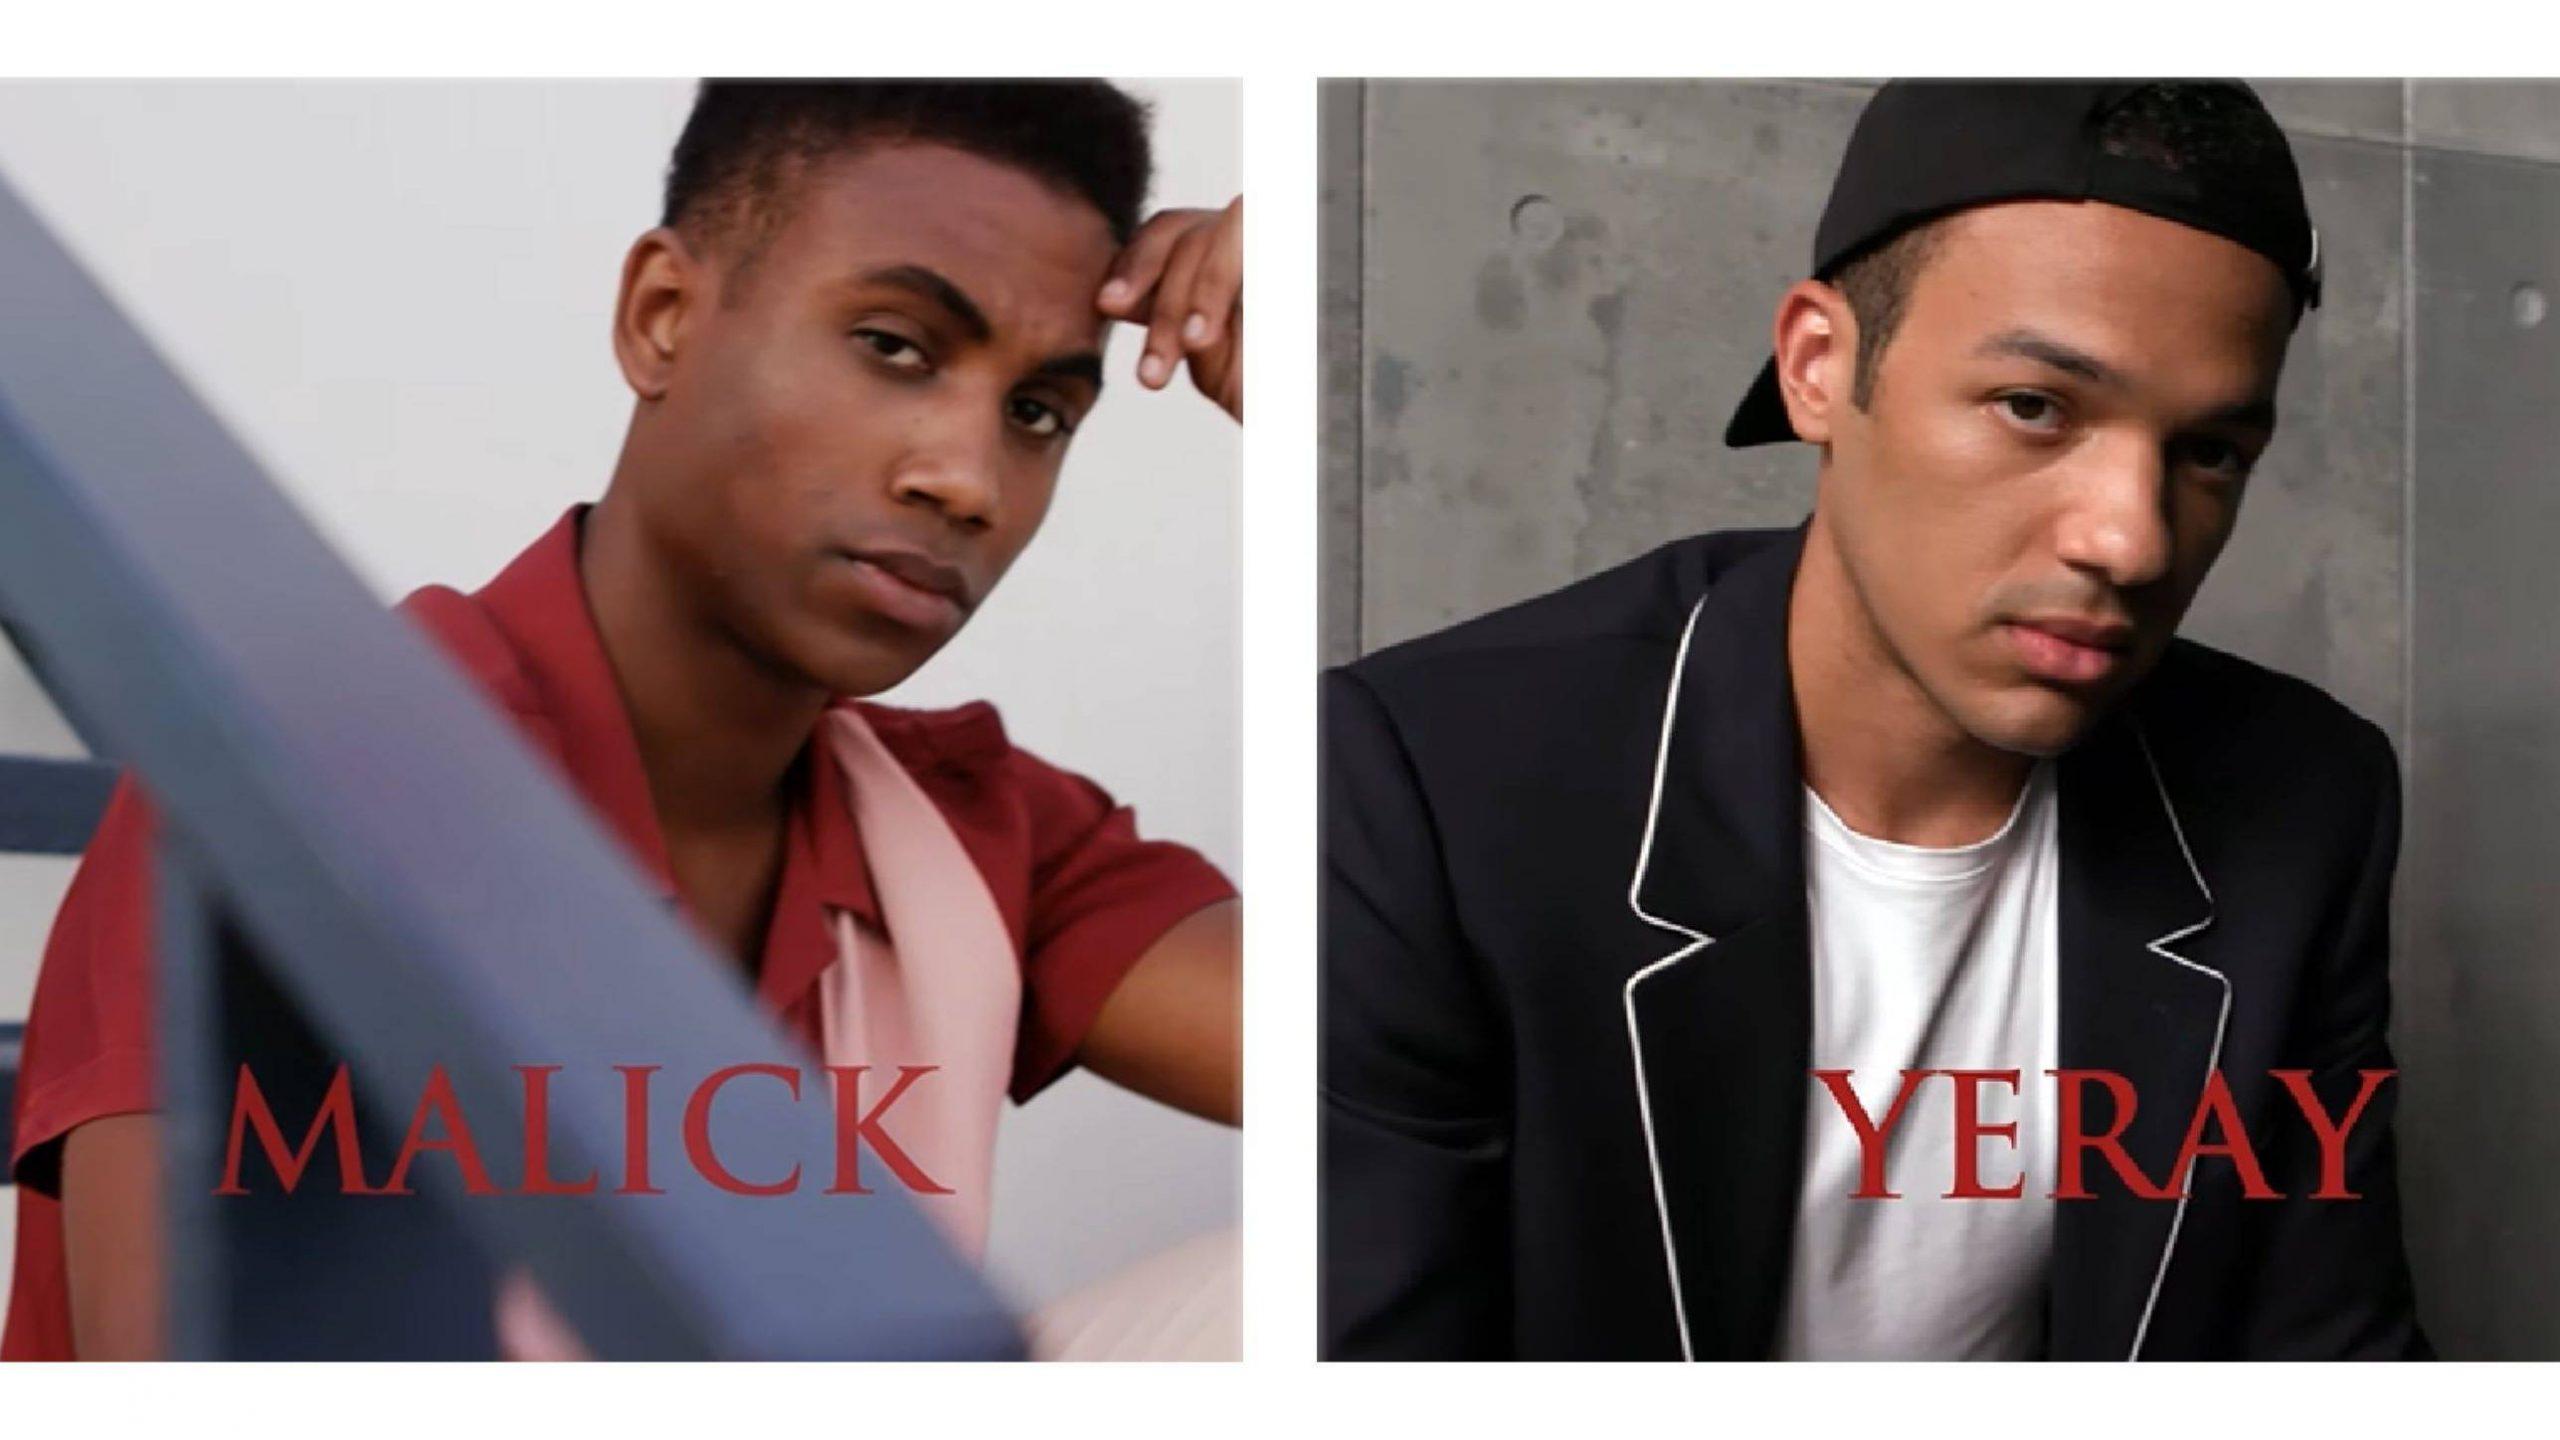 Malick & Yeray Élite 3